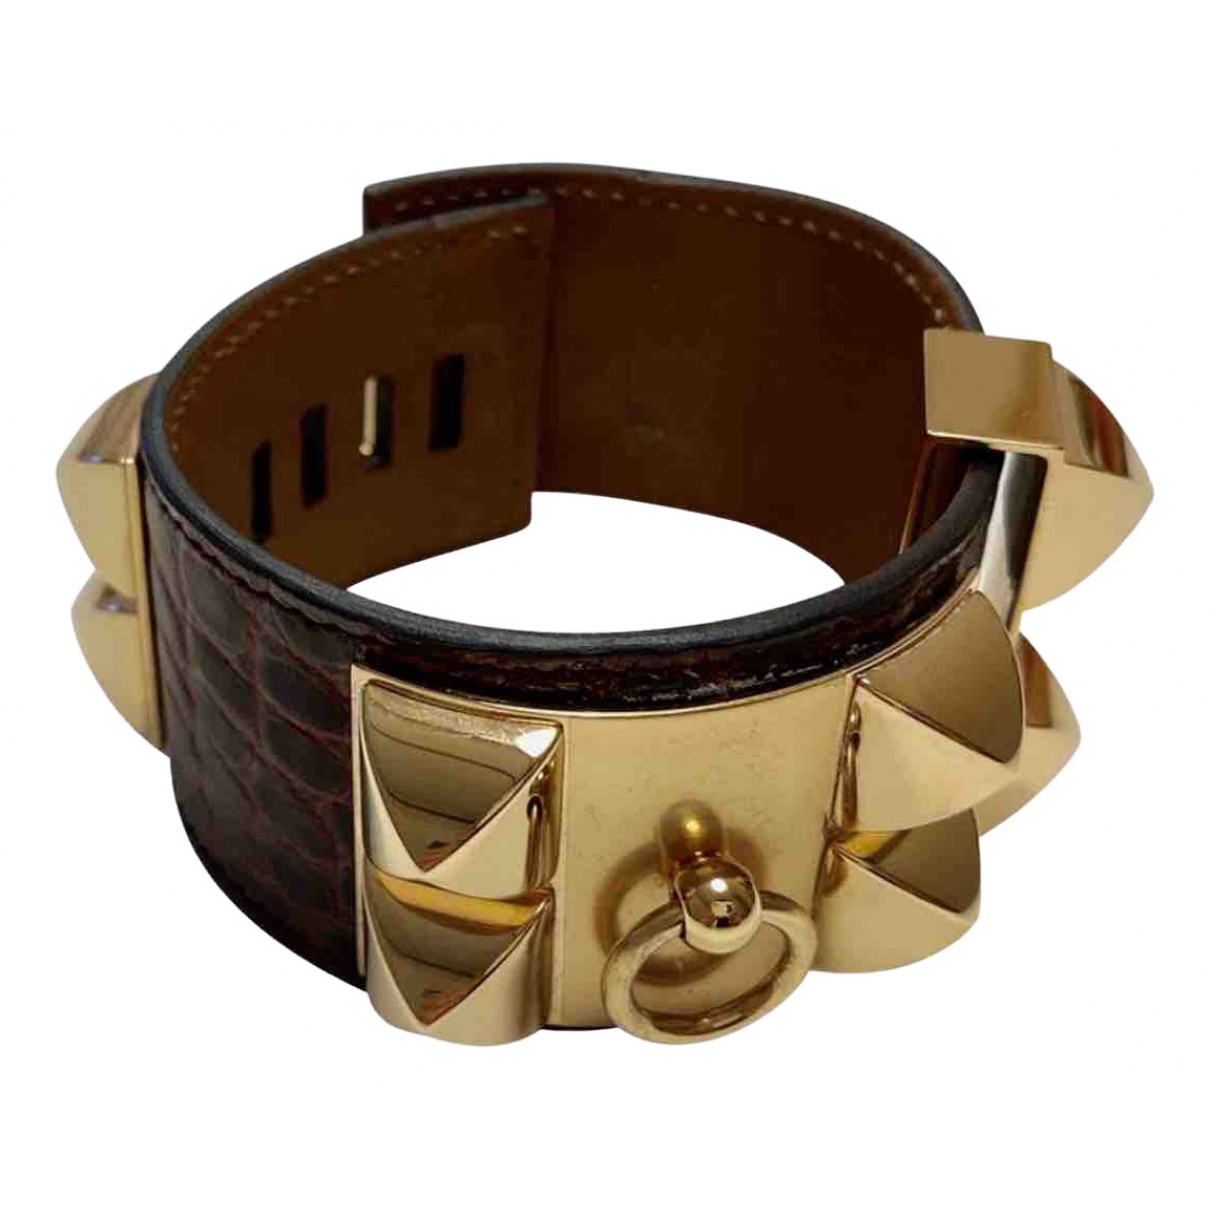 Hermes Collier de chien  Armband in  Bordeauxrot Aligator